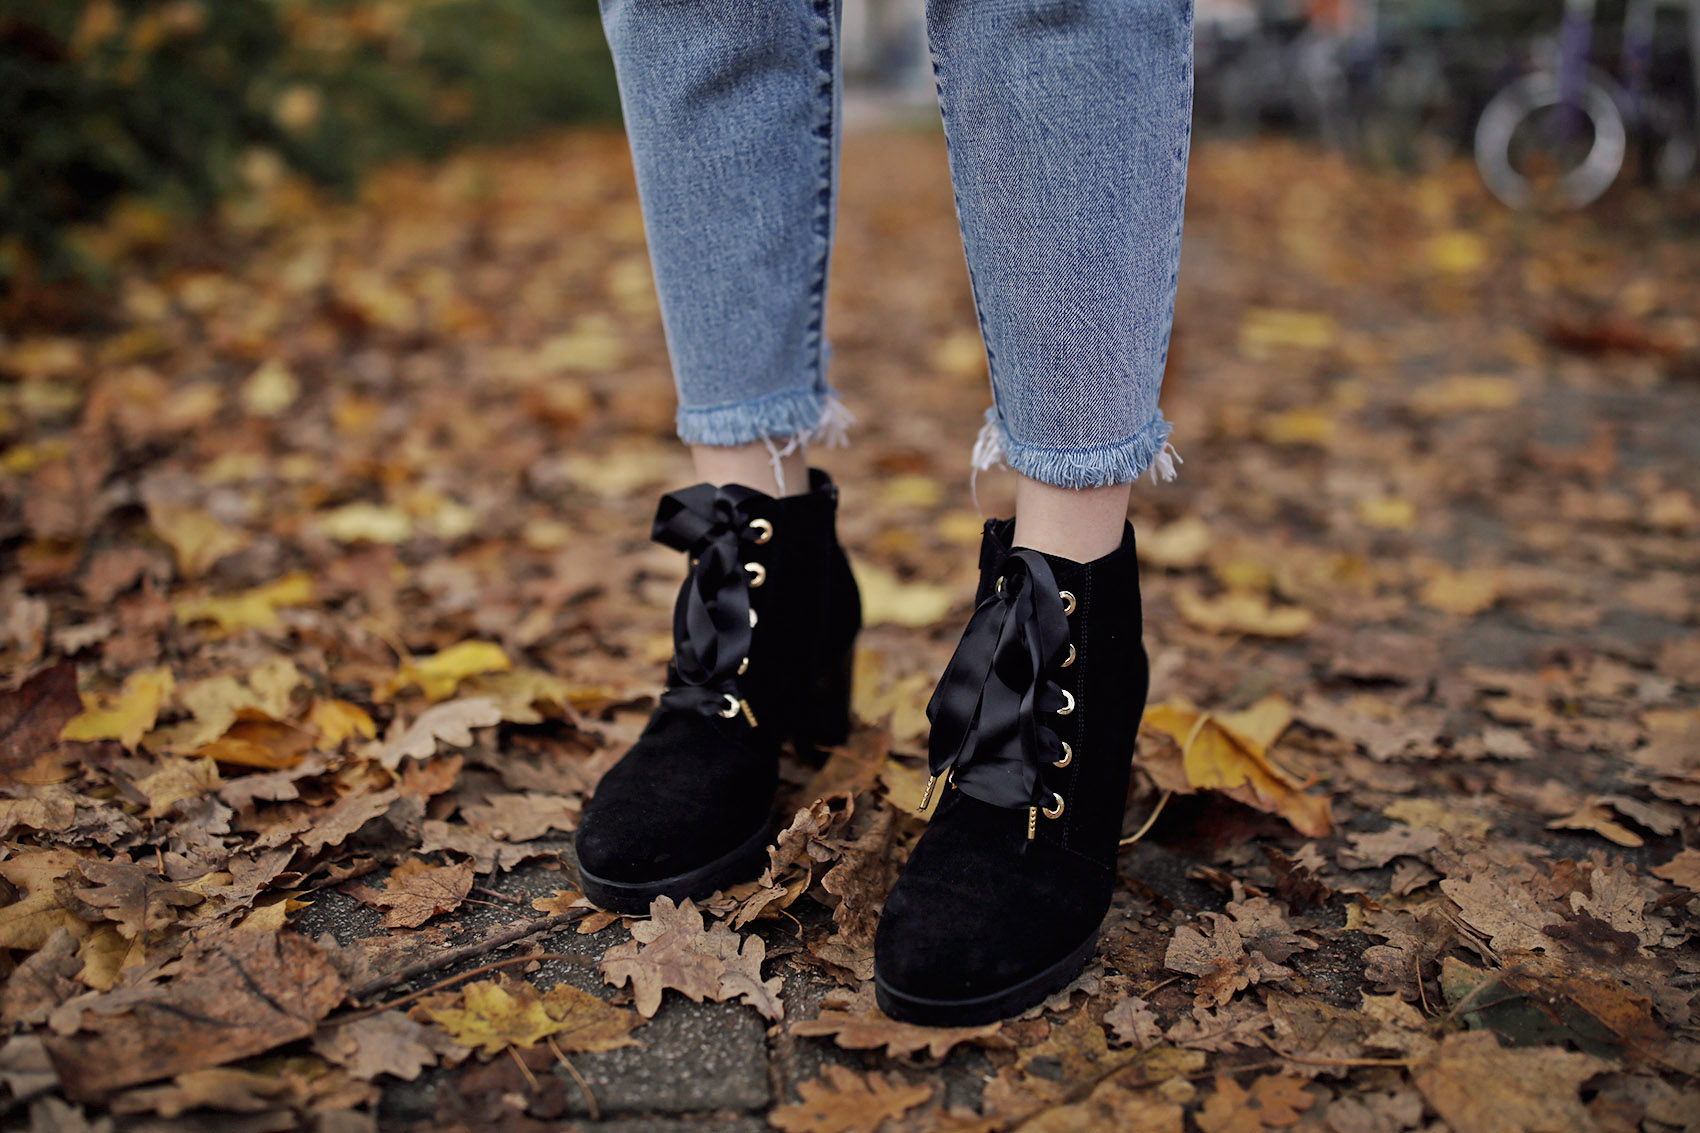 schuhe, sneaker, samt, velvet, jeans, plateau, biker boots, schnallenboots, nietenboots, stiefel, stiefeletten, schnürstiefel